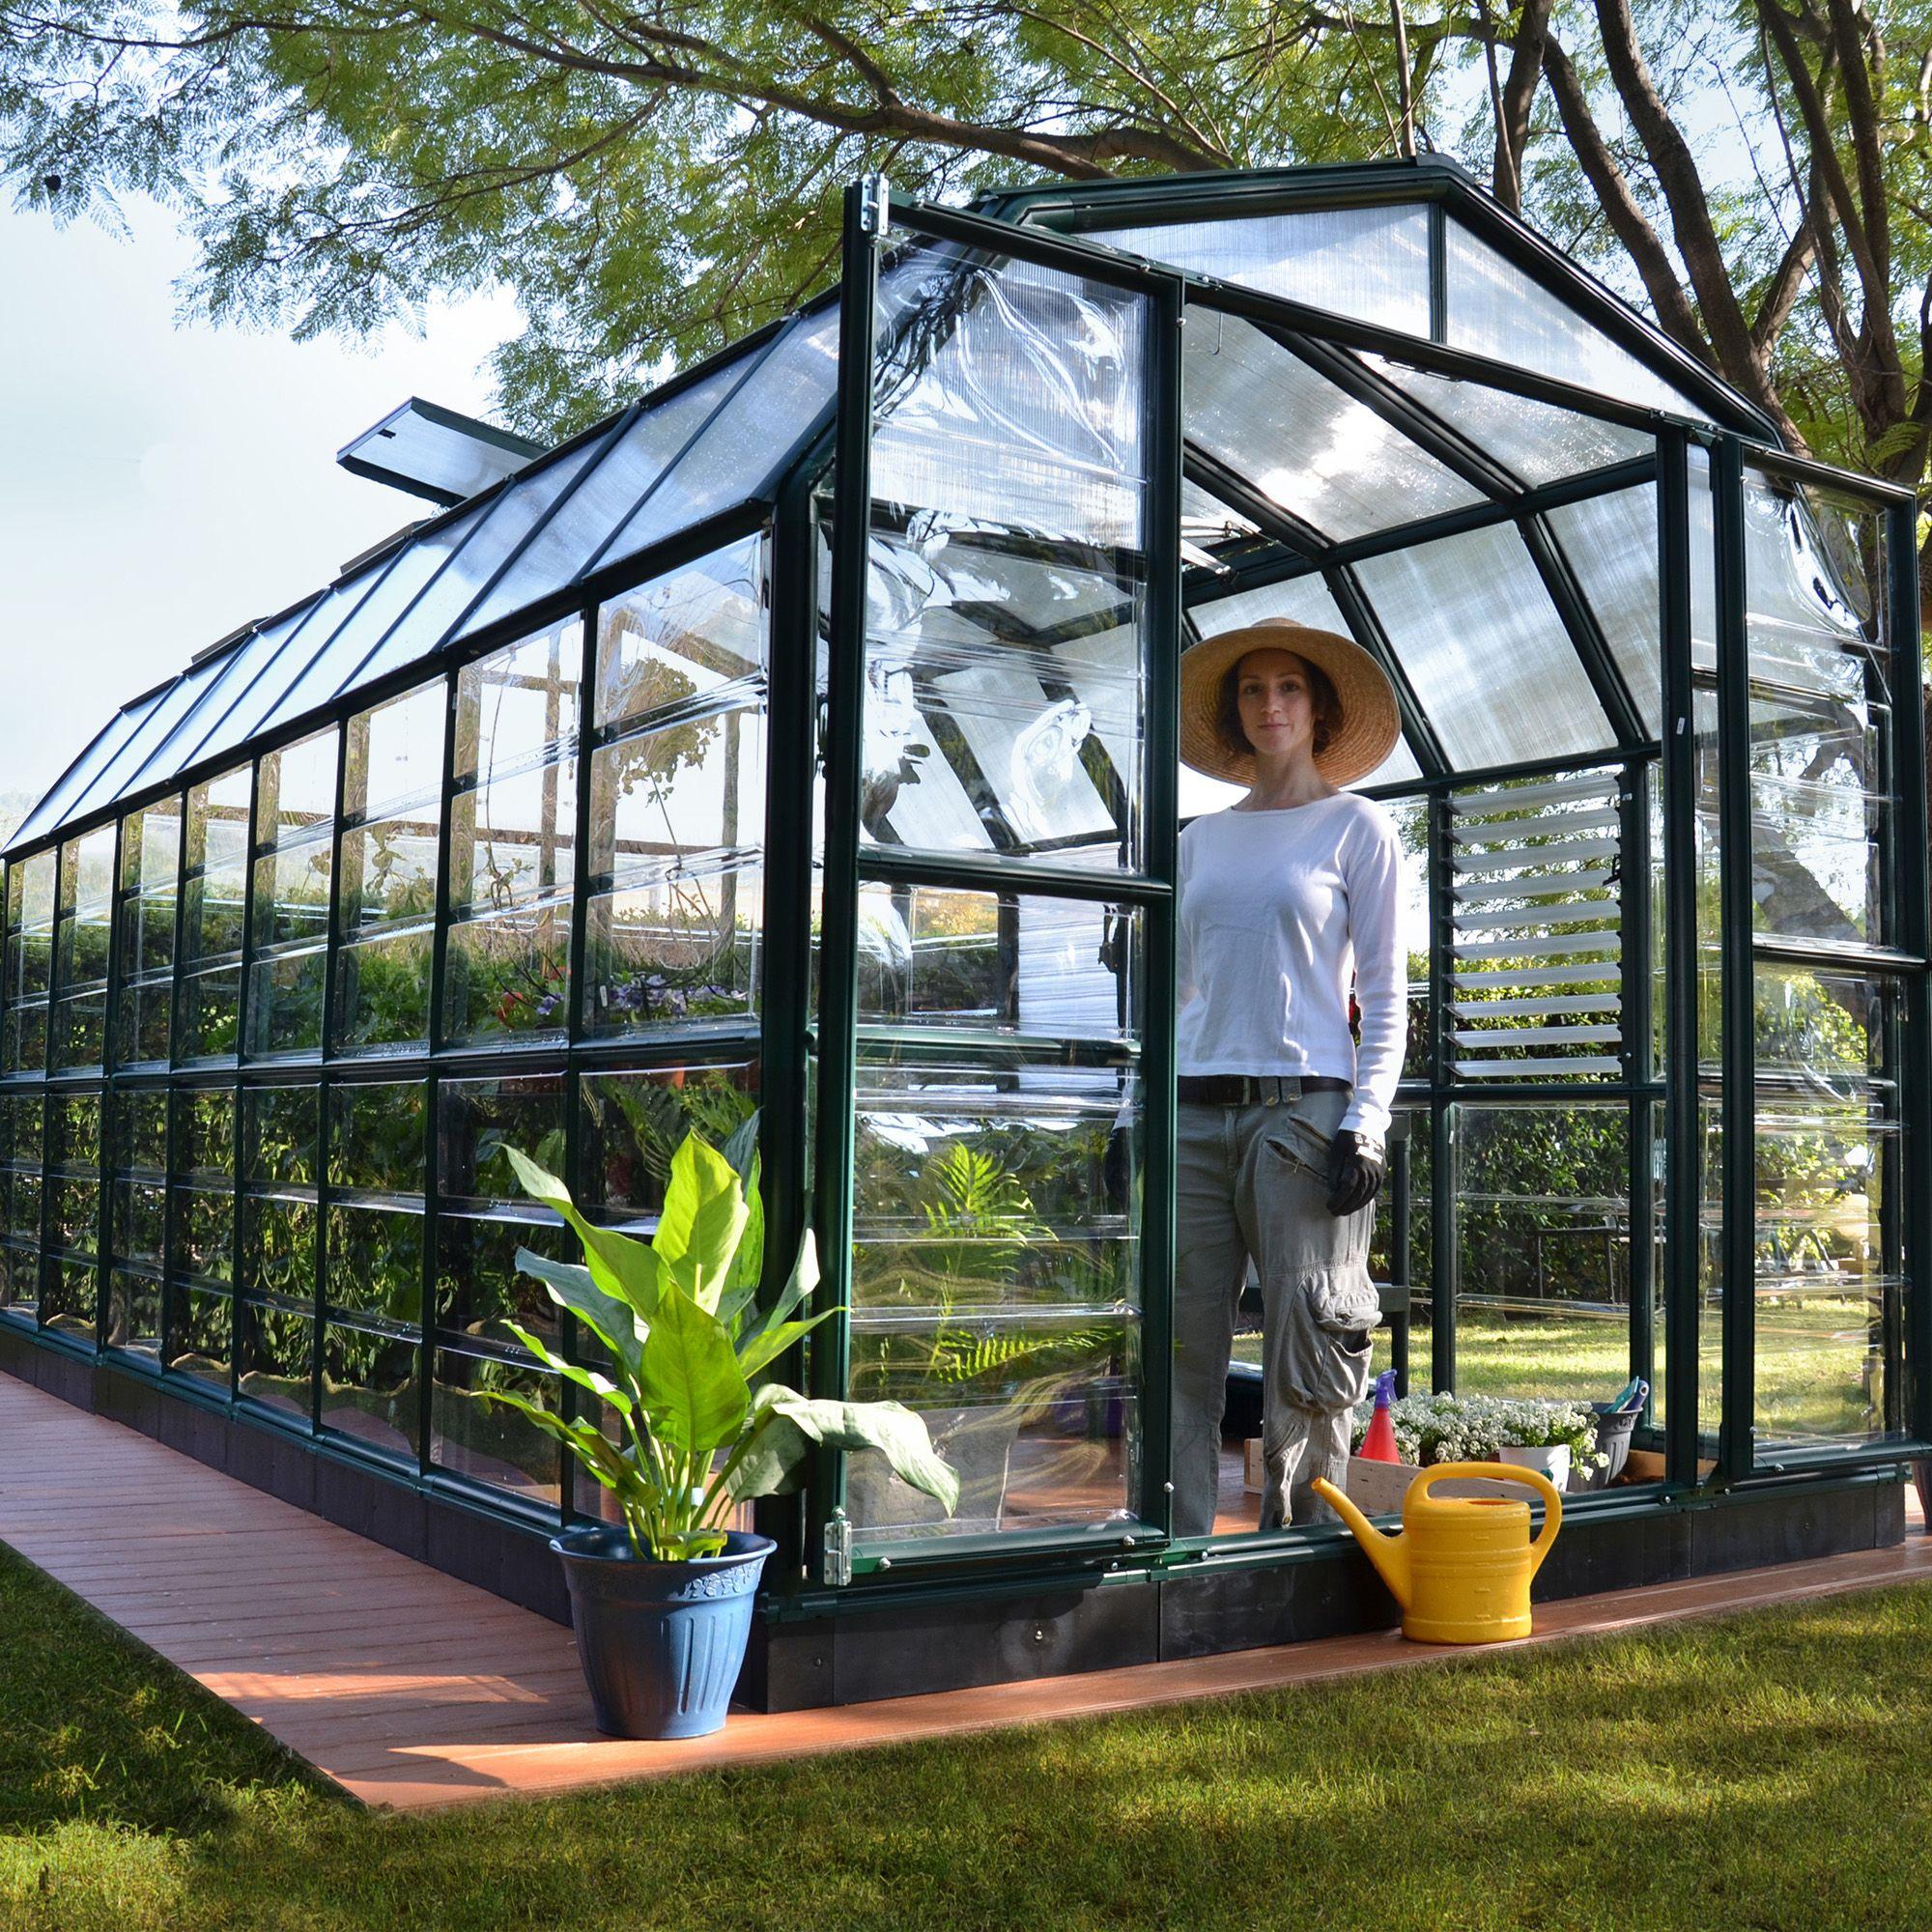 Window Greenhouse Insert Kitchen Window Greenhouses: Rion Grand Gardner 8x20 Acrylic Glass Greenhouse